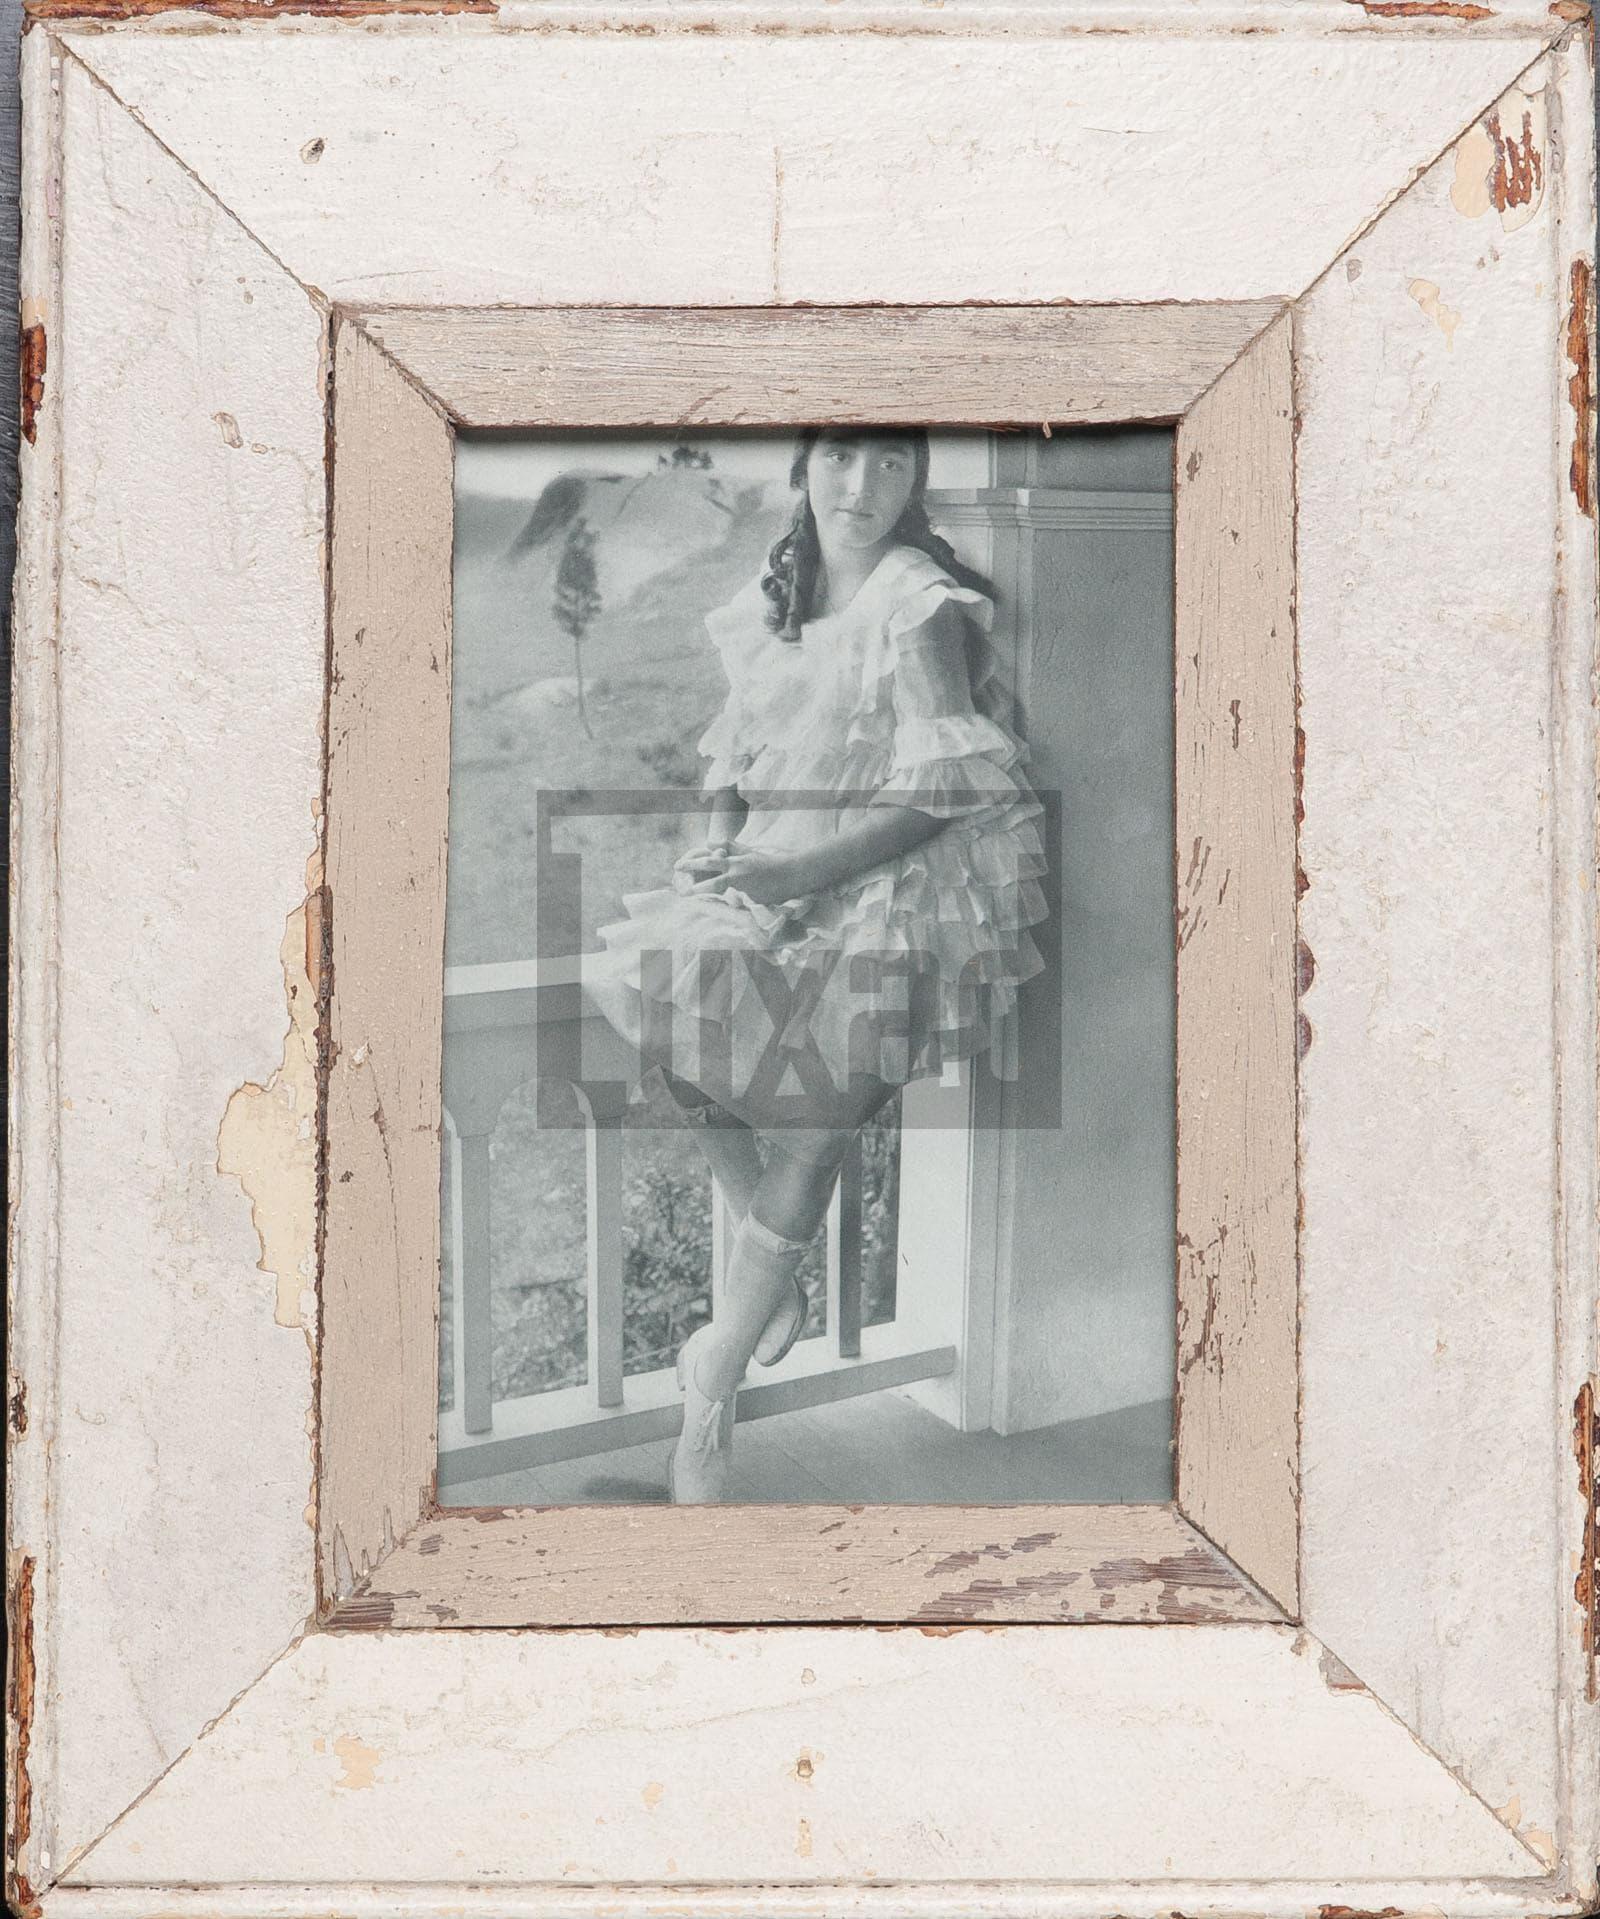 Vintage-Fotorahmen aus recyceltem Holz von Luna Designs